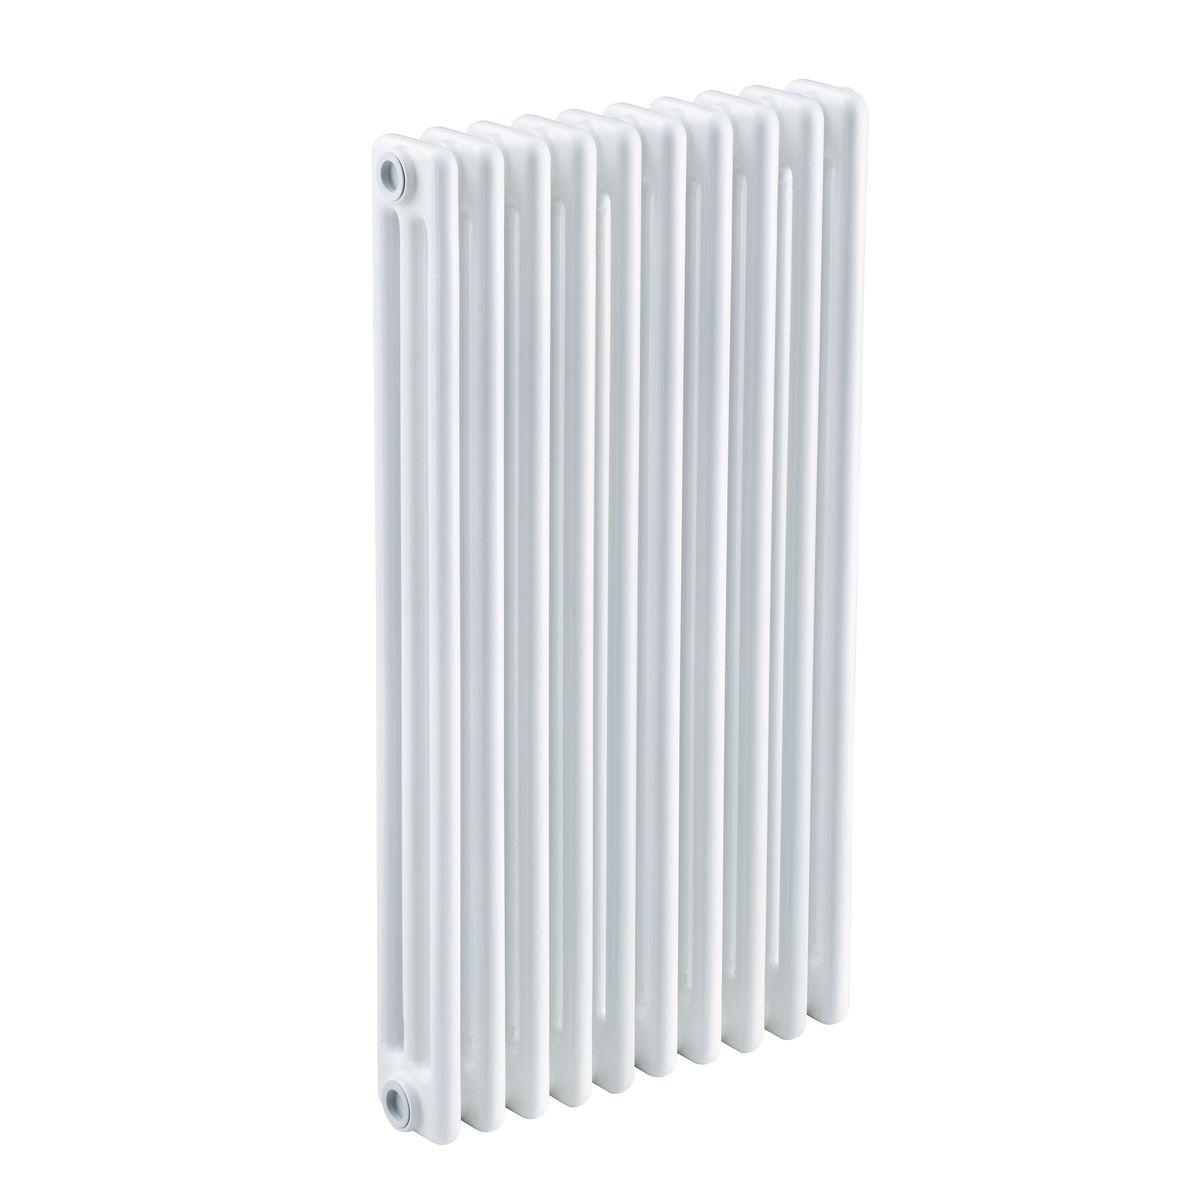 Best radiatori acciaio prezzi gallery for Mensole termosifoni leroy merlin